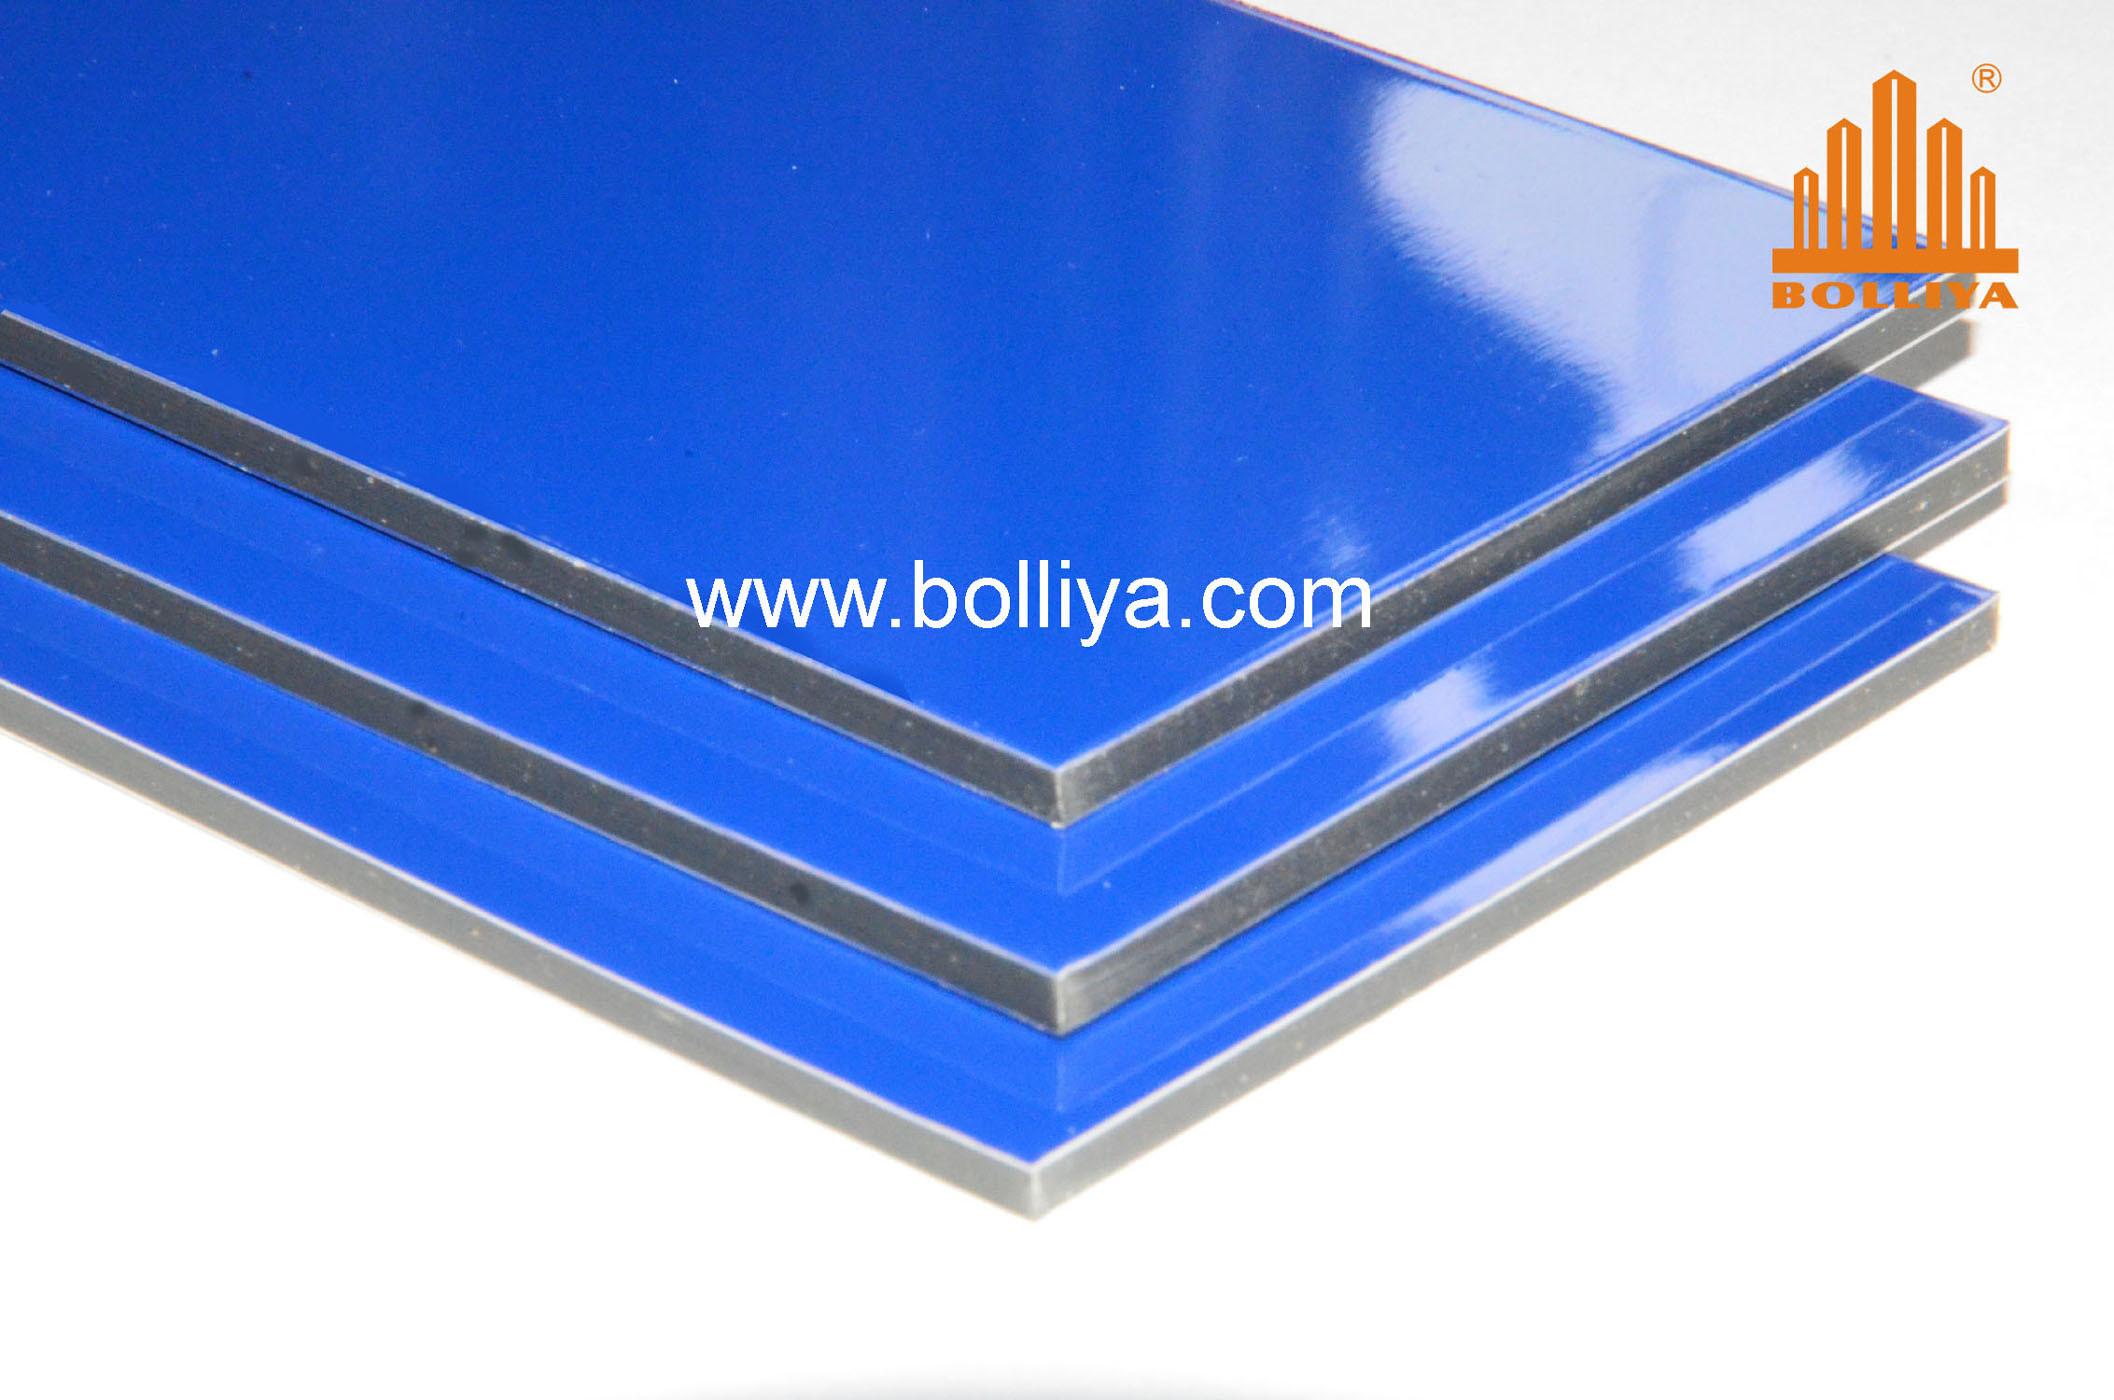 Aluminum Signage Materials for Advertisement / Suitable for Printing / 5002 Ultramarine Blue